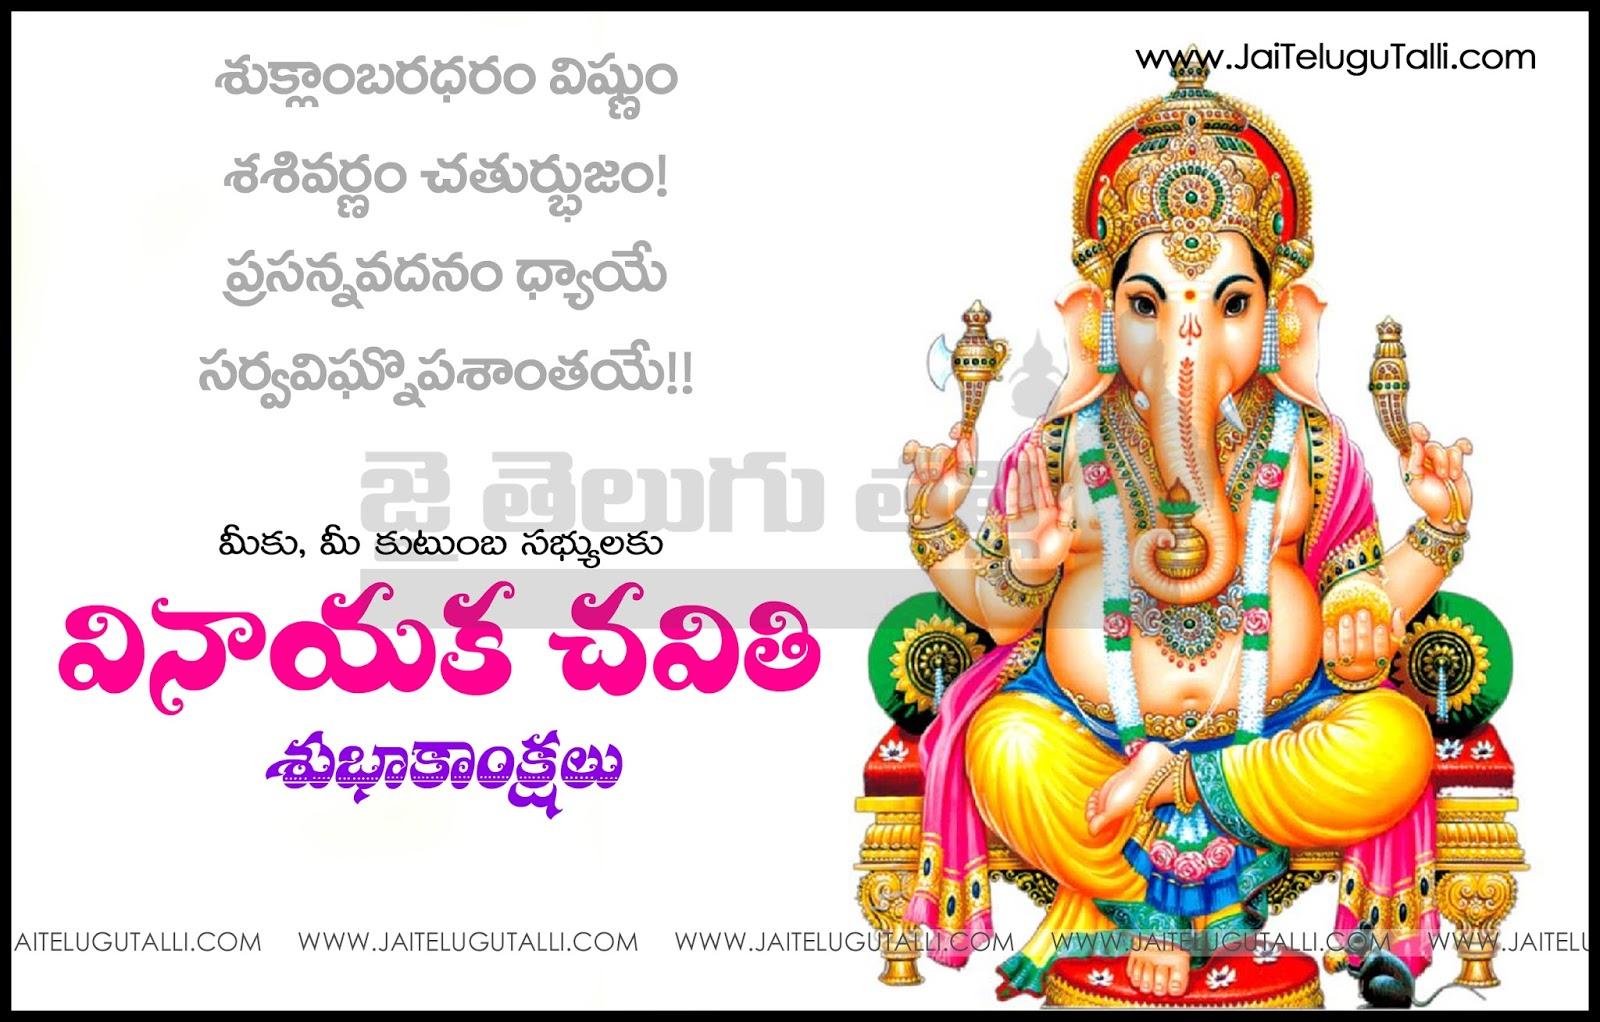 Vinayaka chavithi wishes and quotes in telugu language www here is a happy vinayaka chavithi telugu greetingshappy ganesh chaturthi 2015 quotes sms m4hsunfo Gallery